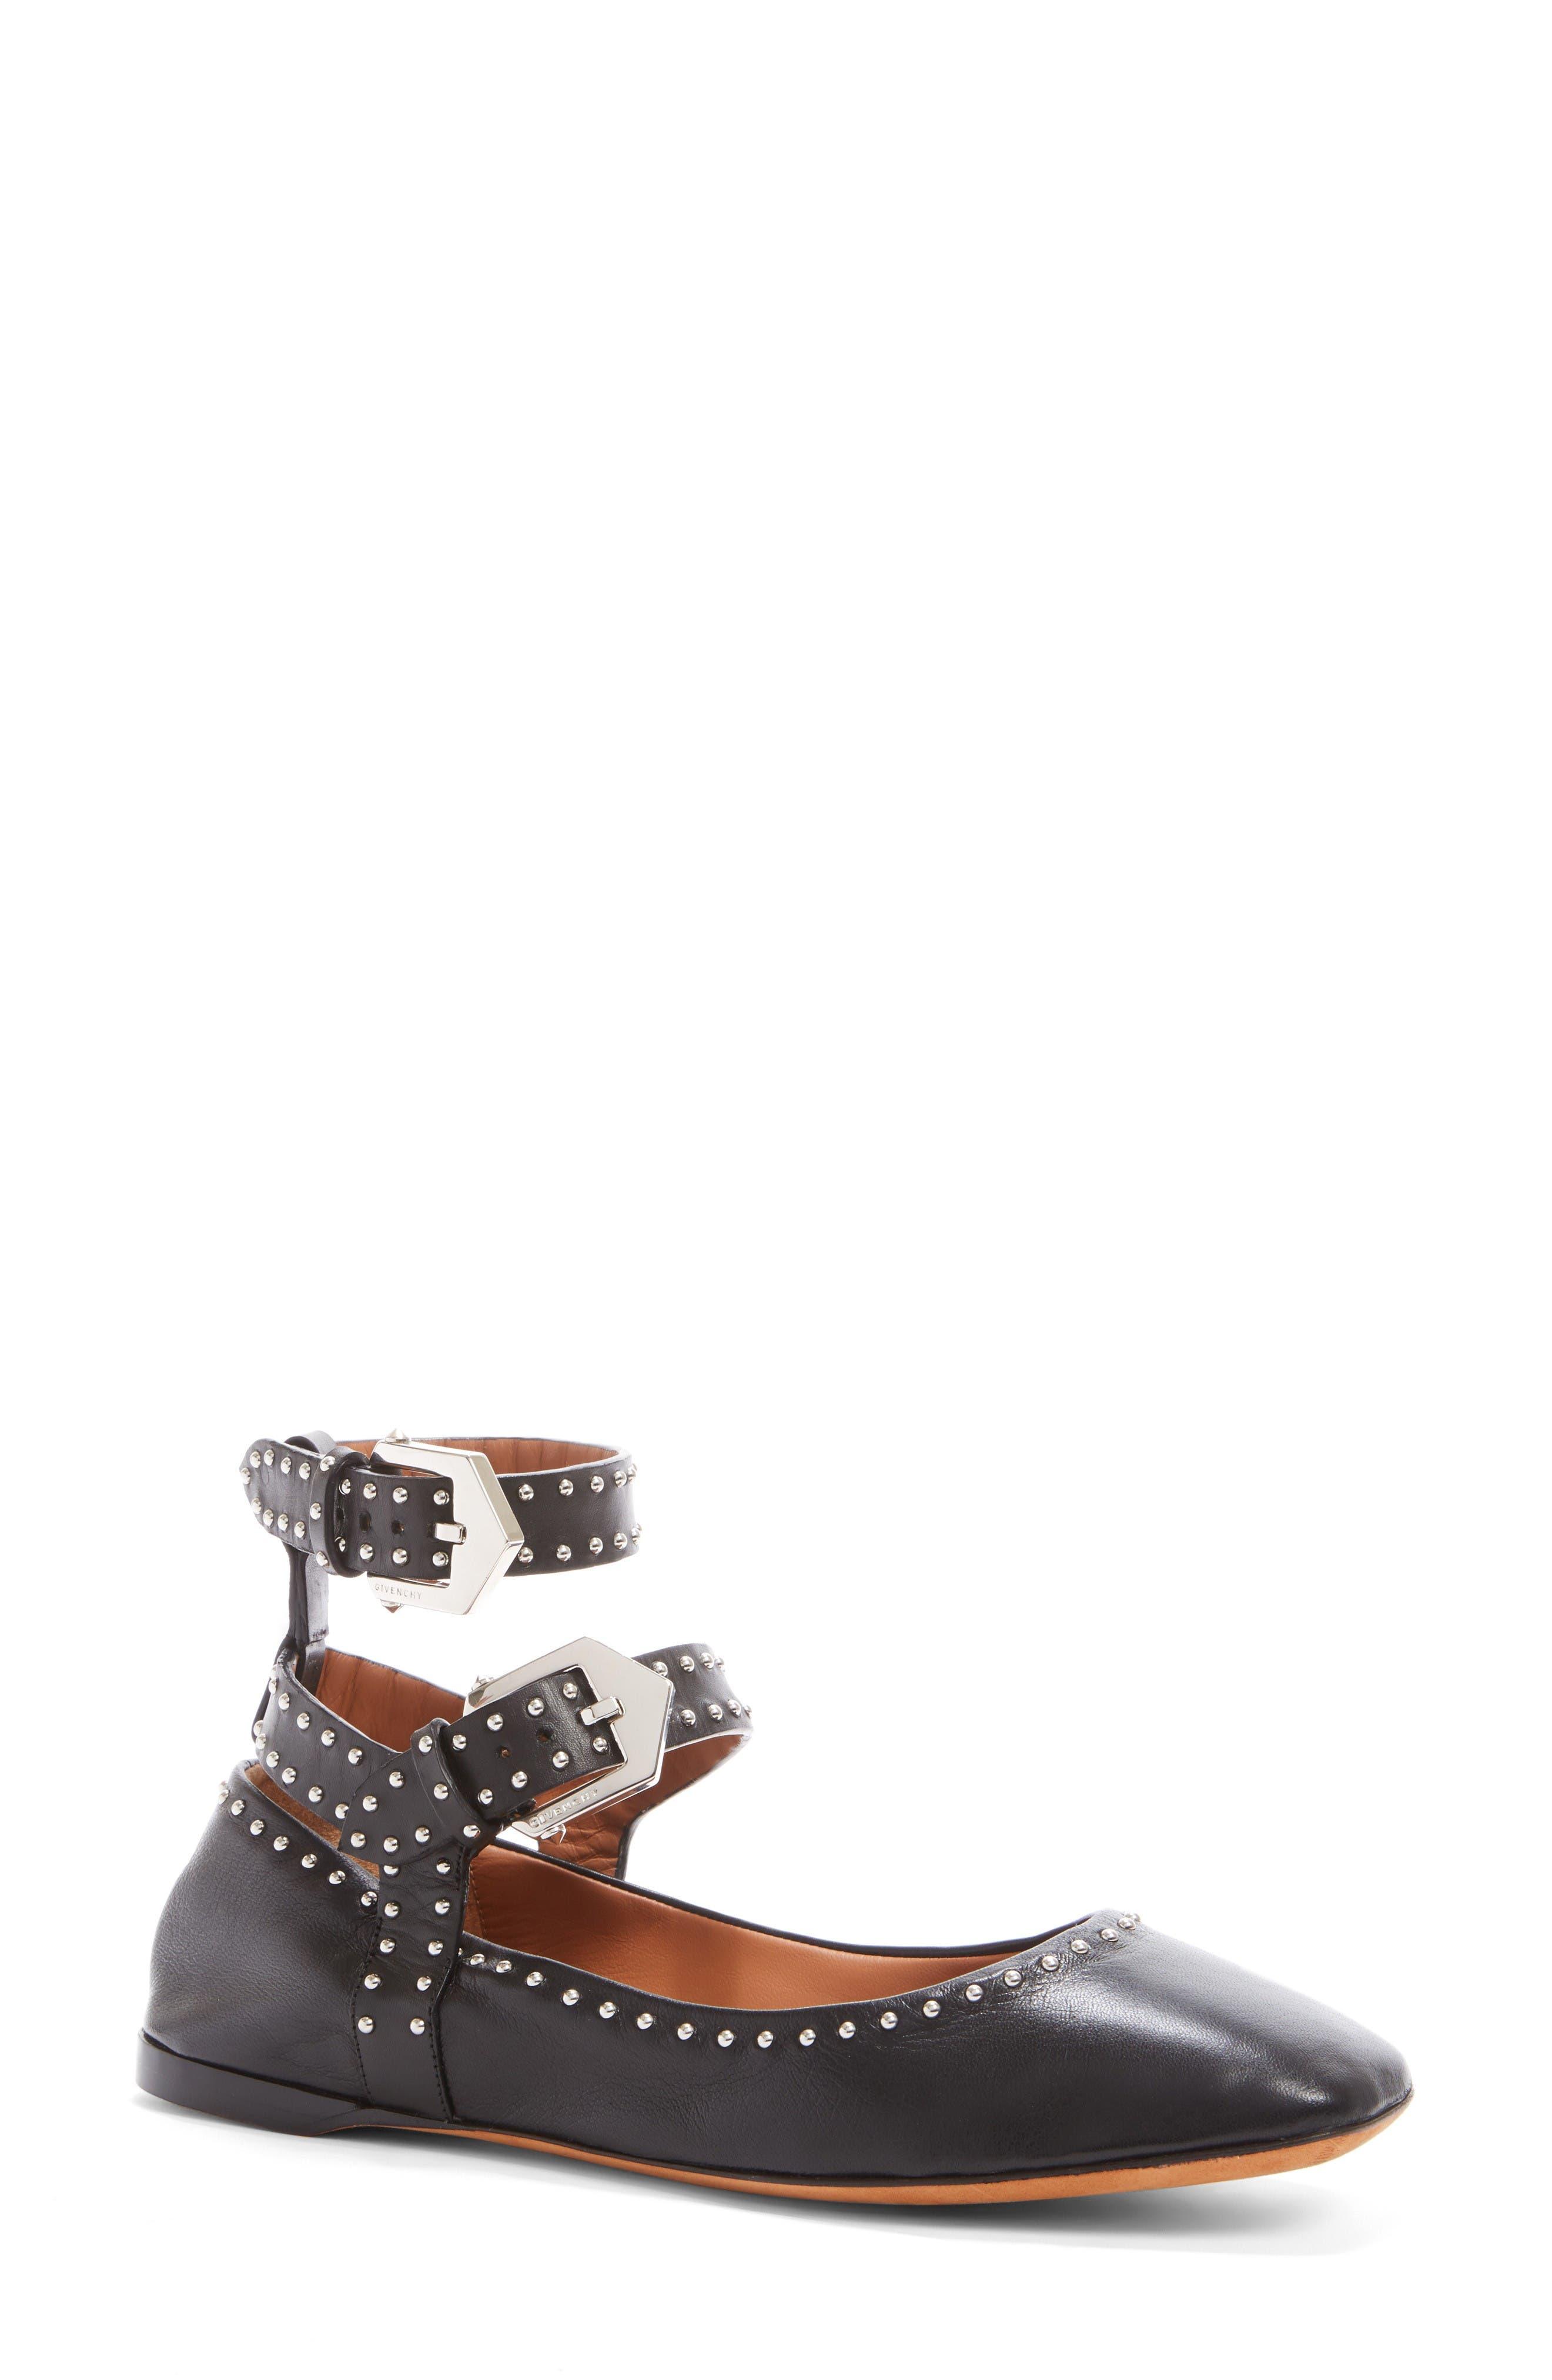 GIVENCHY Studded Ankle Strap Flat